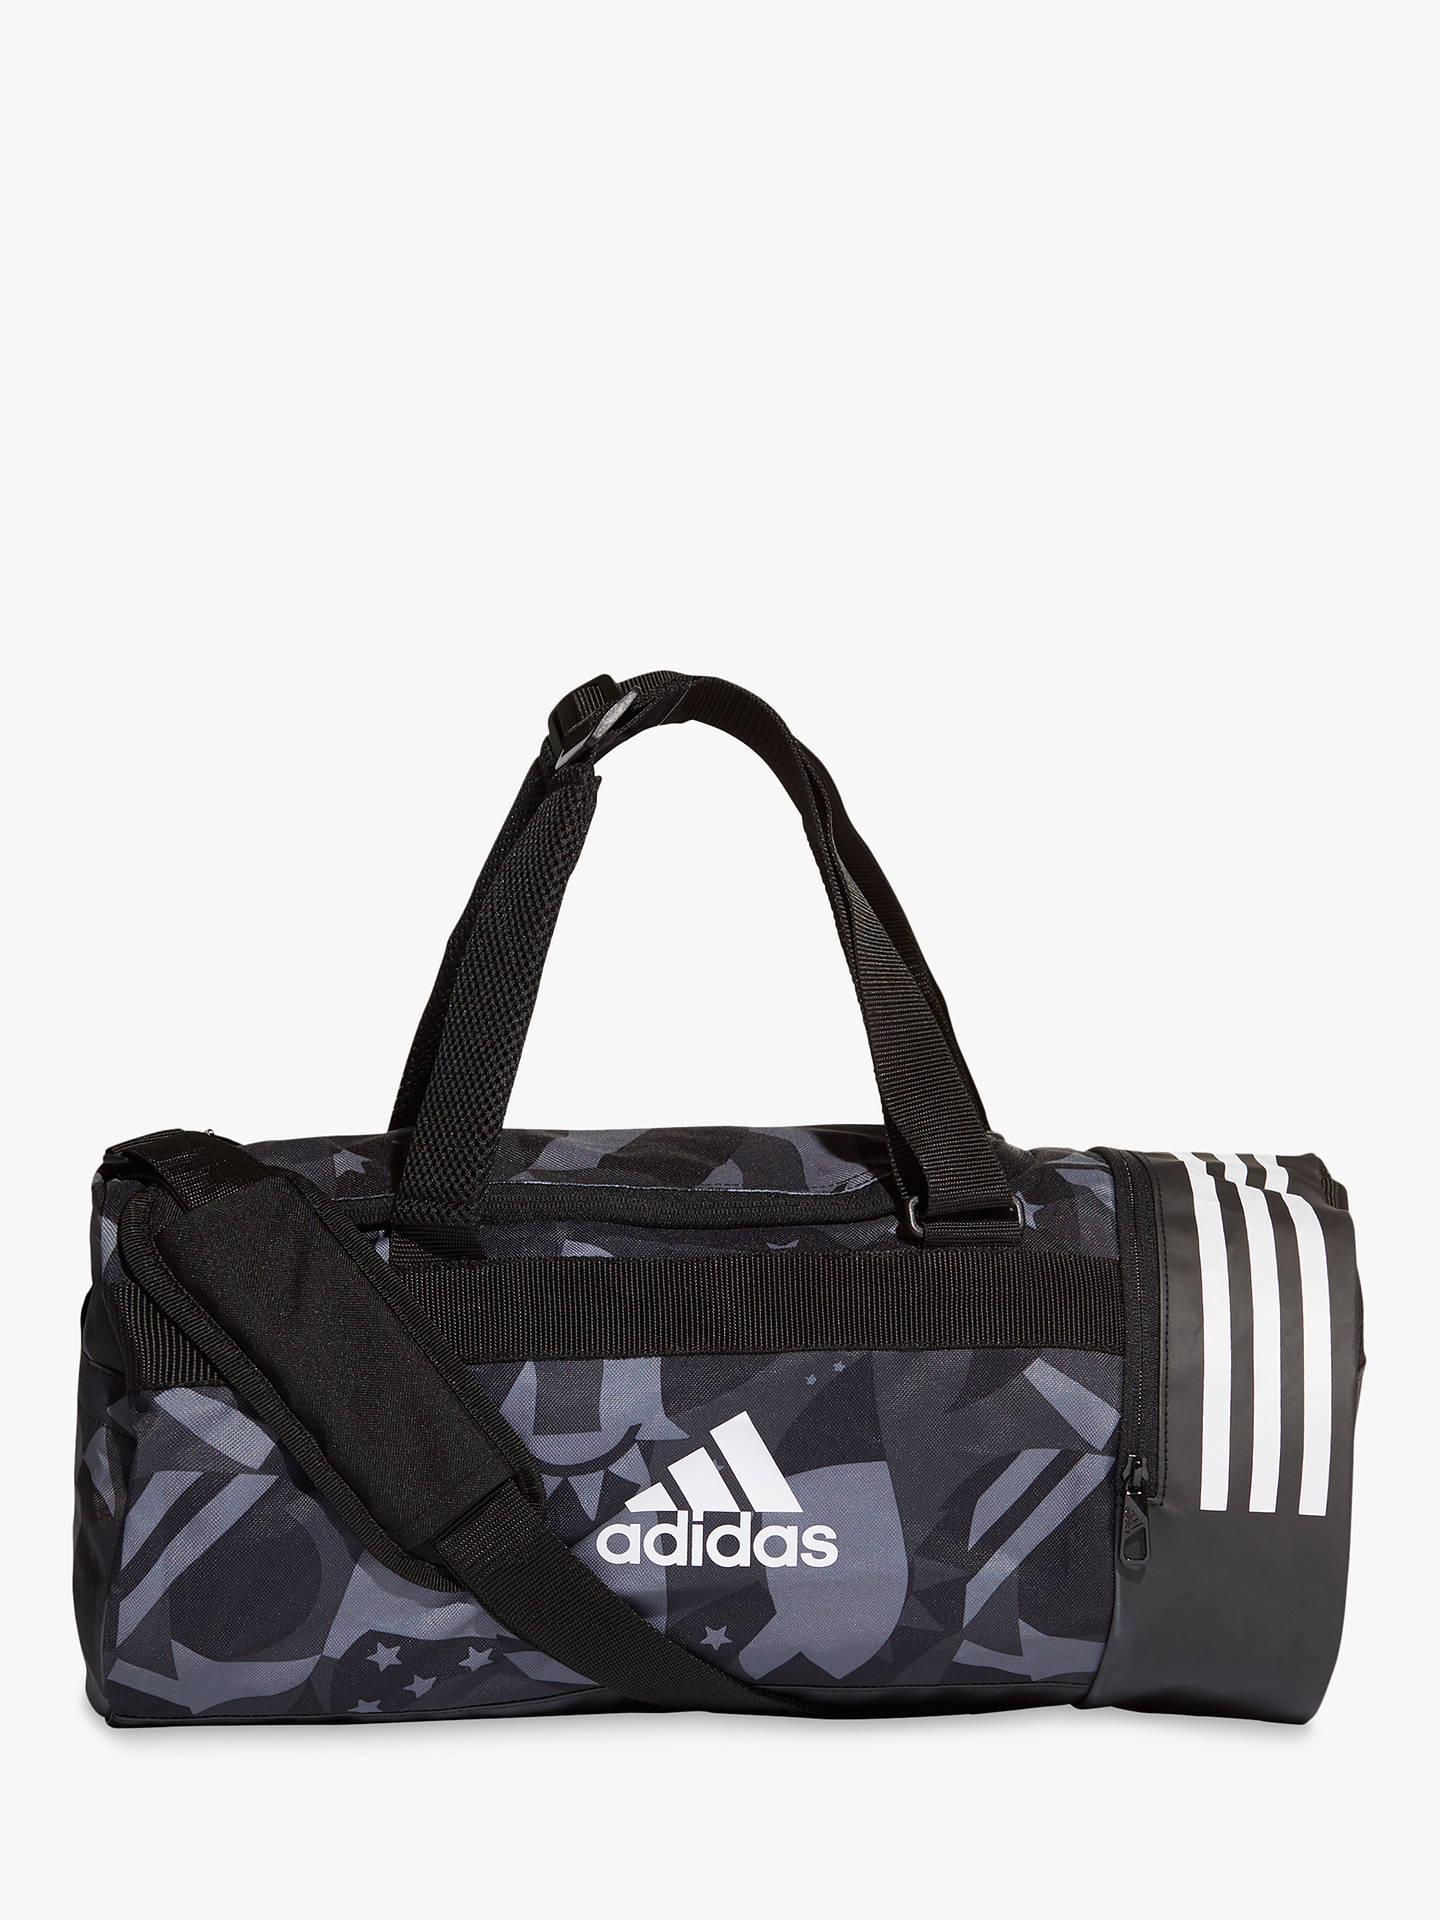 08bdcab92cb adidas 3-Stripes Convertible Graphic Duffel Bag, Black/White at John ...